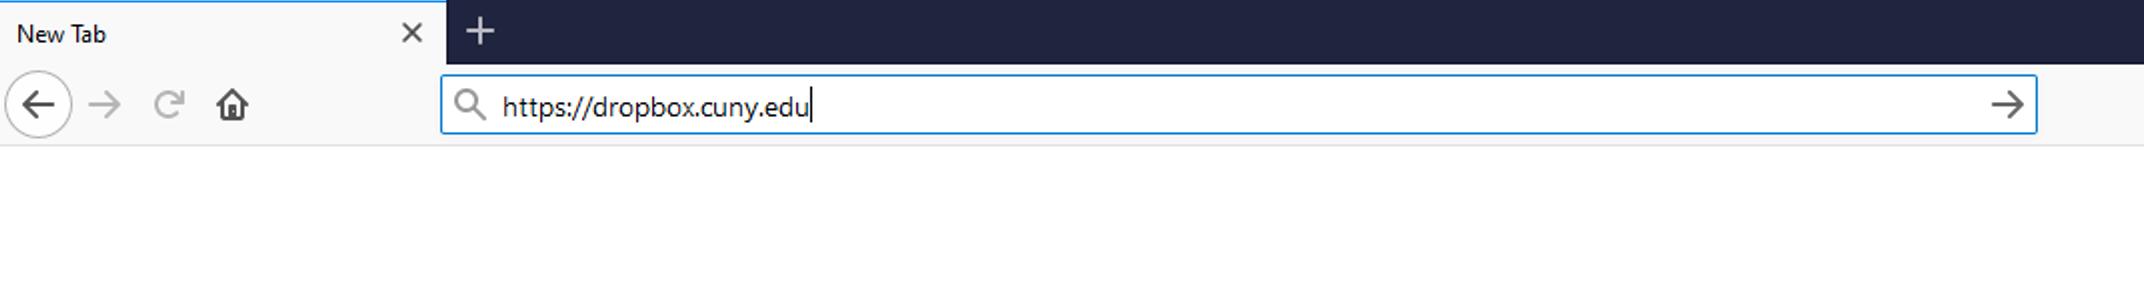 Use Dropbox - Step-1.png